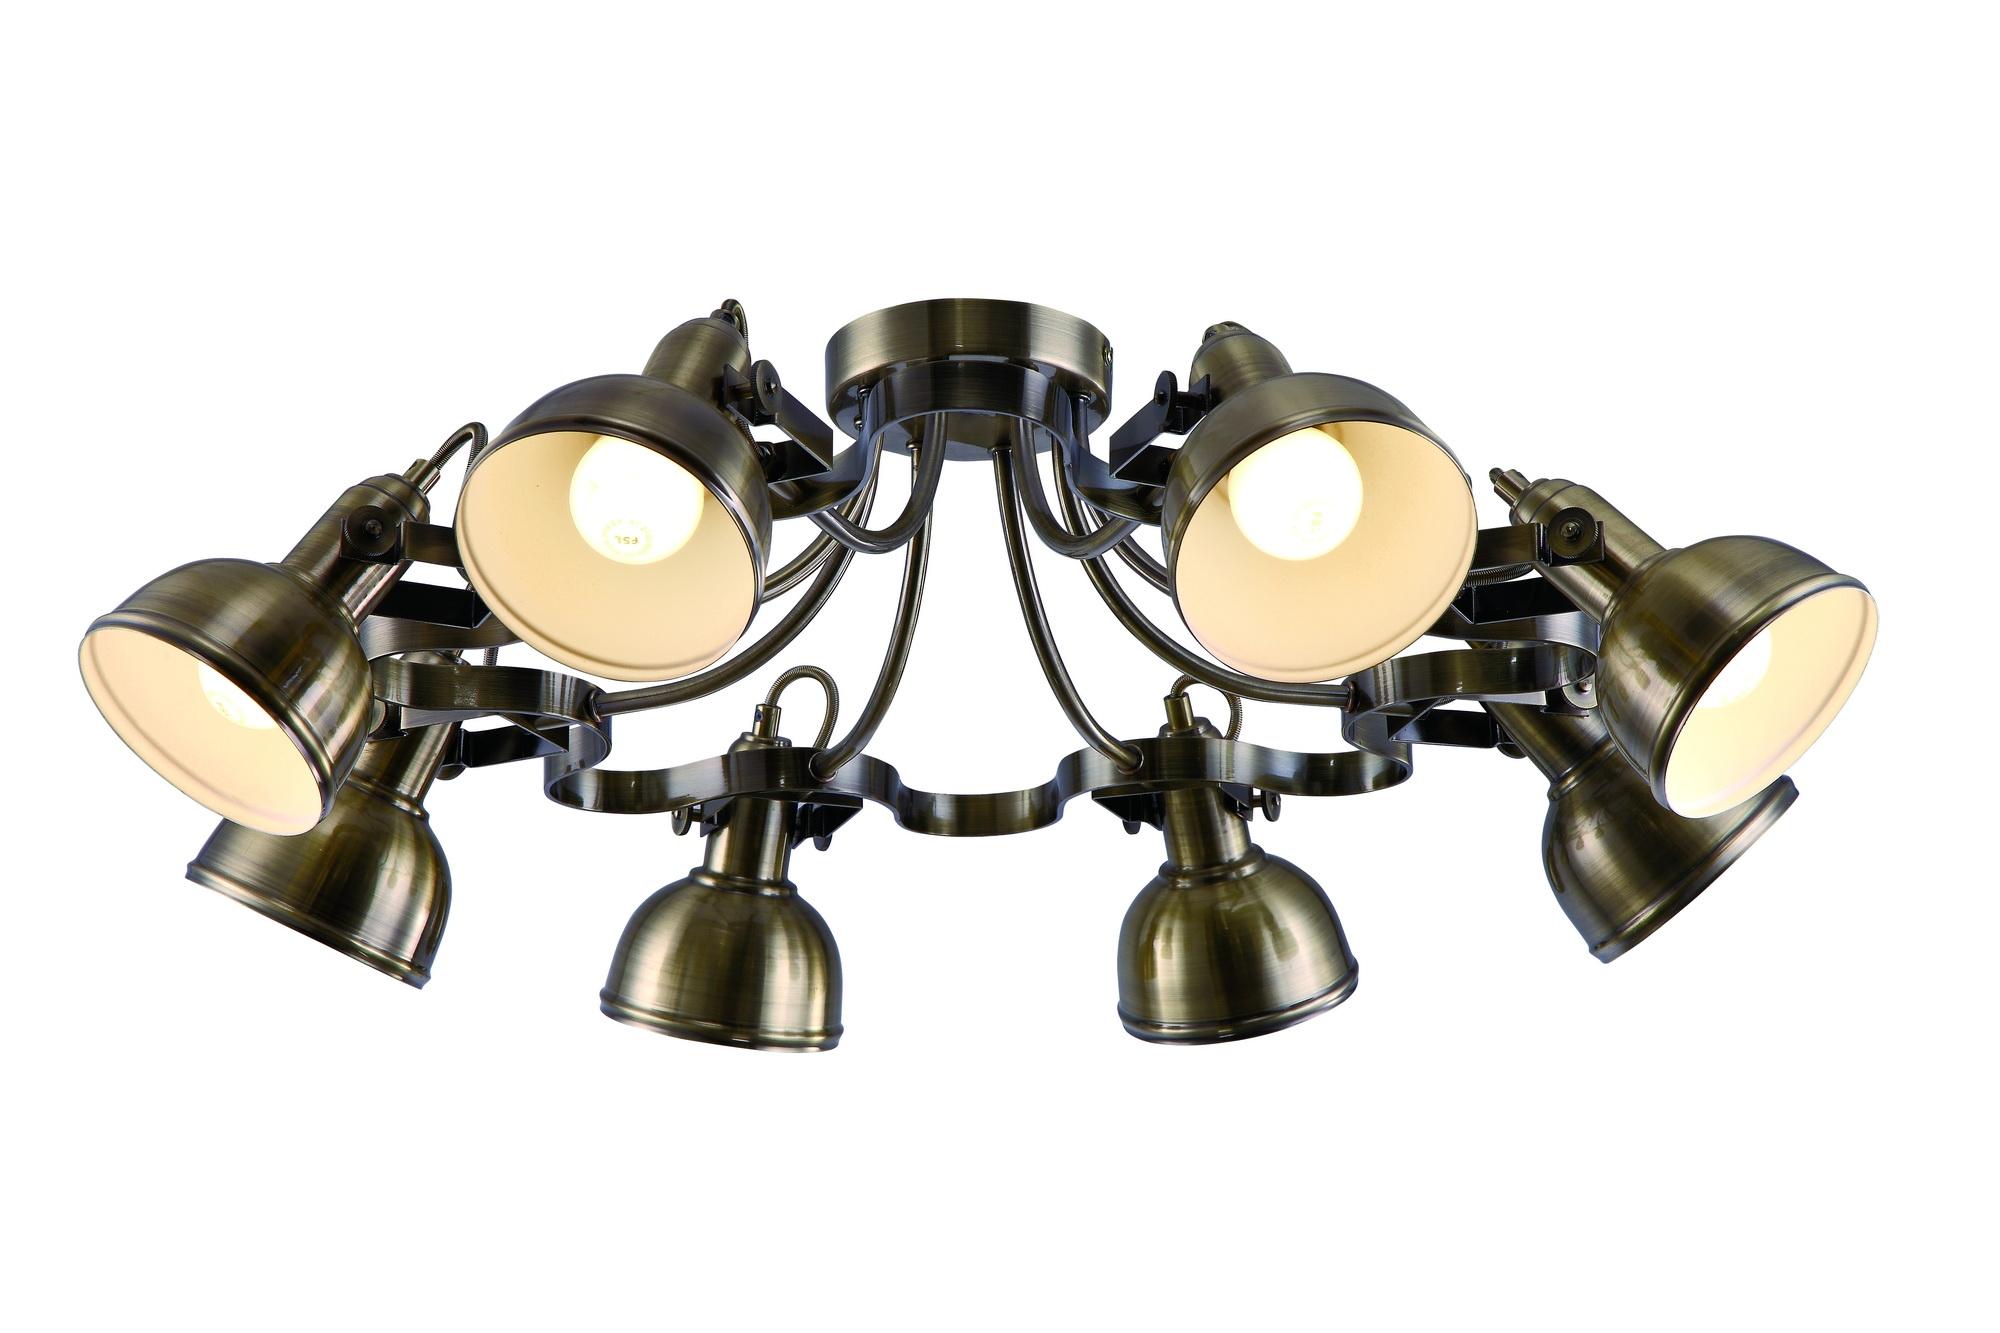 Люстра Arte lampЛюстры<br>Назначение светильника: для комнаты,<br>Стиль светильника: модерн,<br>Тип: потолочная,<br>Материал светильника: металл,<br>Материал арматуры: металл,<br>Длина (мм): 730,<br>Ширина: 730,<br>Высота: 250,<br>Количество ламп: 8,<br>Тип лампы: накаливания,<br>Мощность: 40,<br>Патрон: Е14,<br>Цвет арматуры: бронза<br>